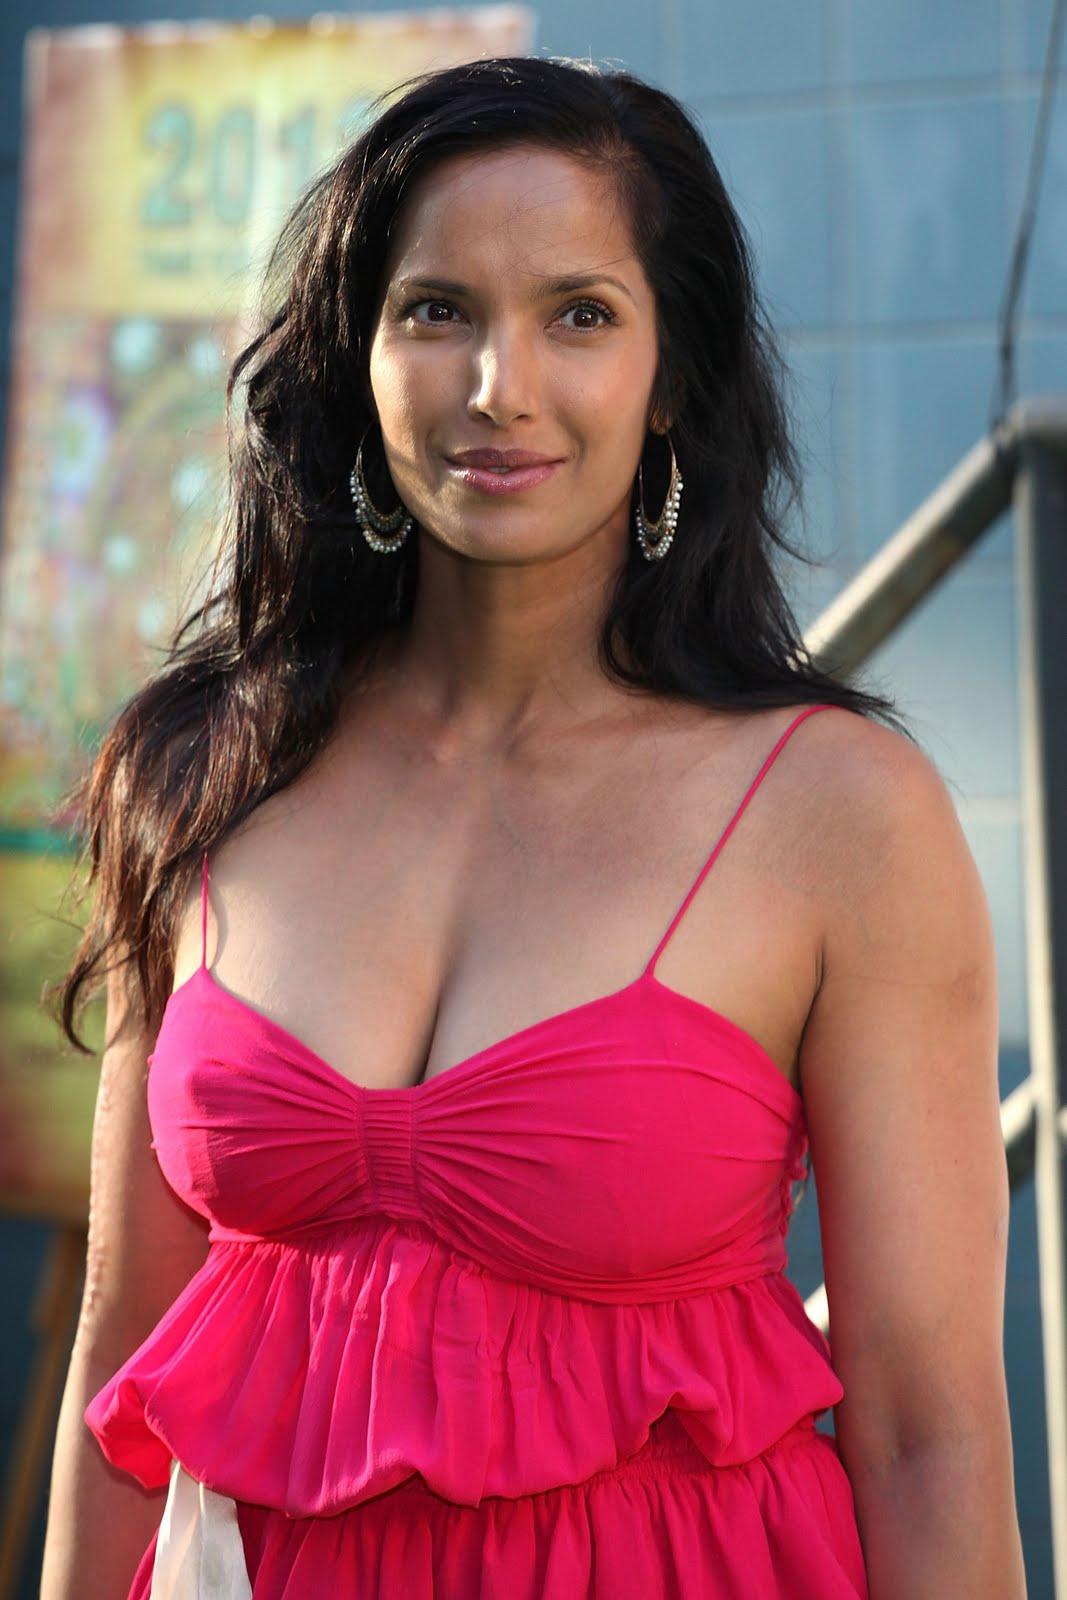 ICloud Padma Lakshmi naked (66 photo), Ass, Paparazzi, Boobs, underwear 2015